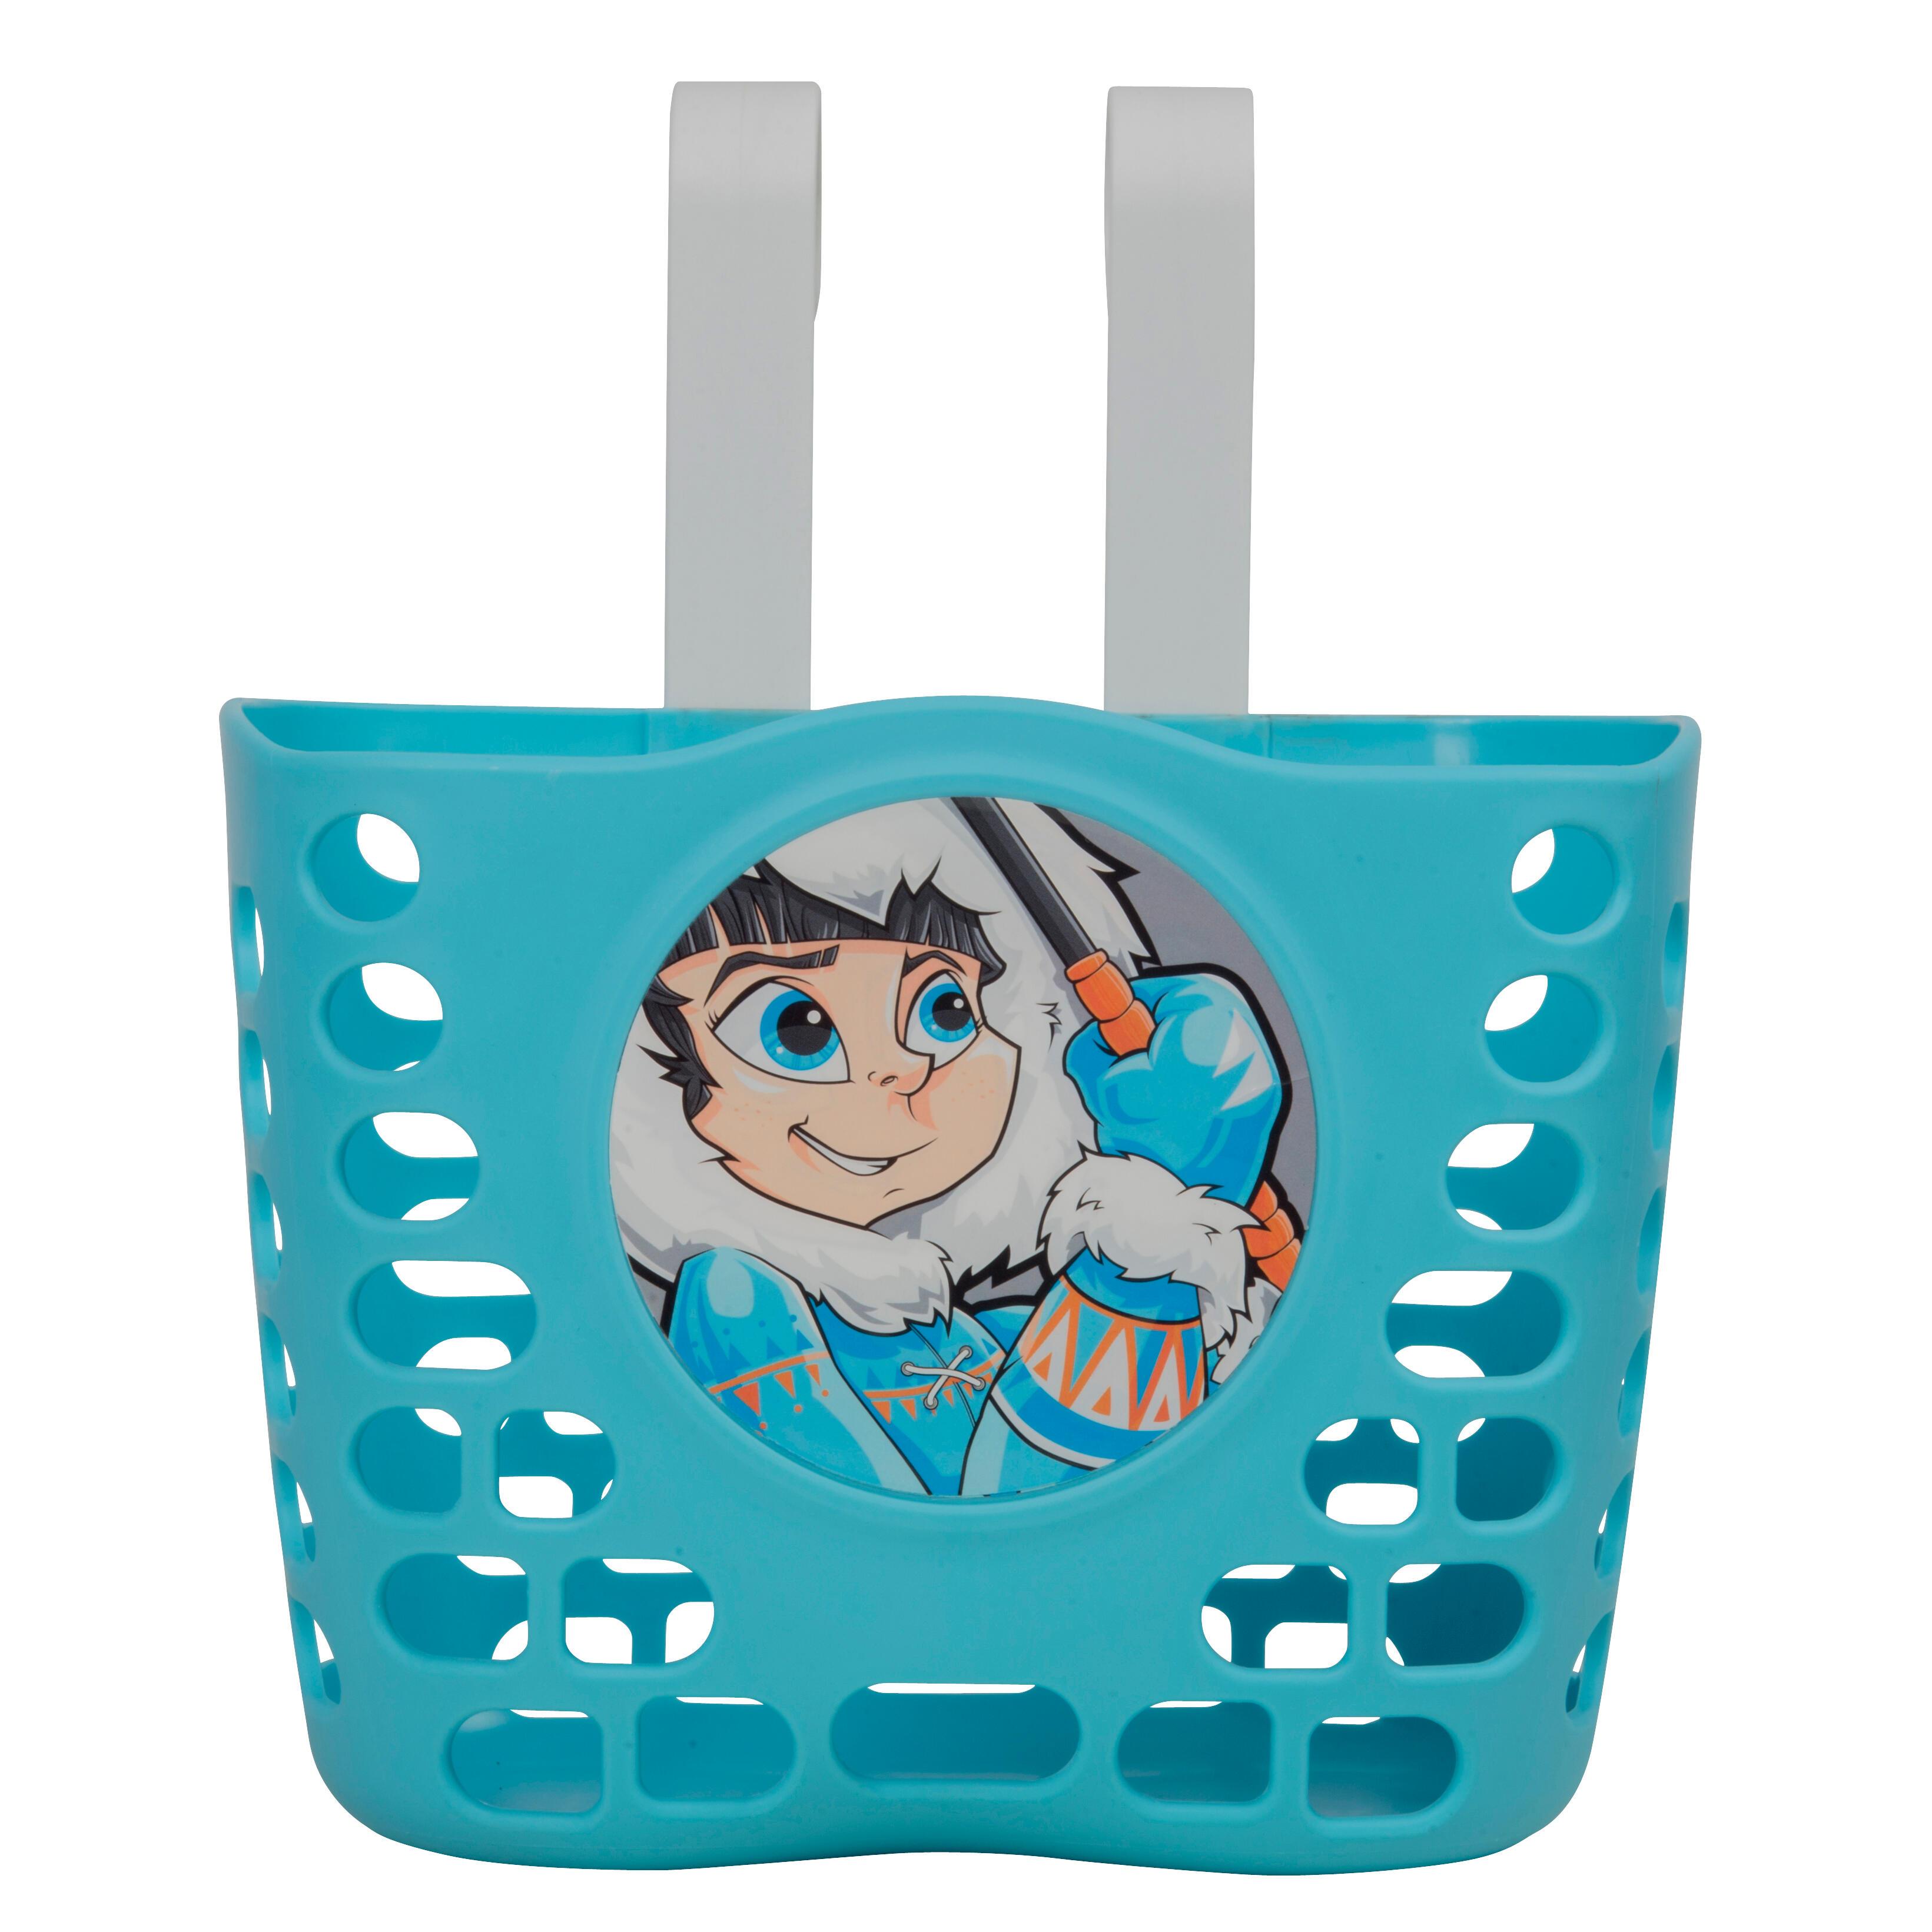 Kids' Bike Basket - Blue